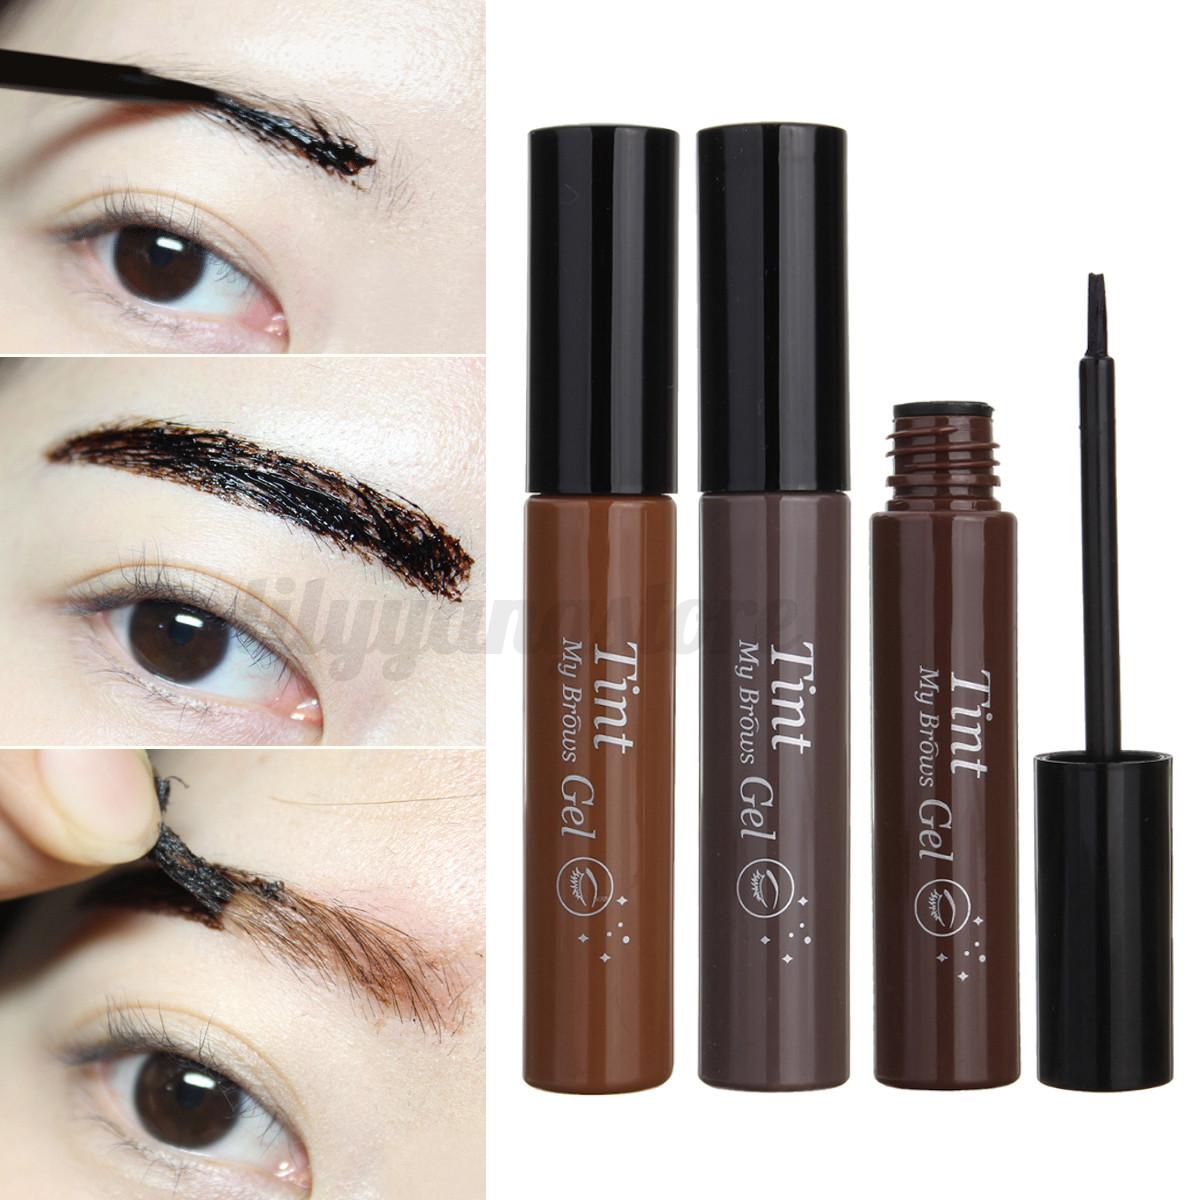 3 colors makeup peel off eyebrow tint my brows gel for Tattoo brow gel